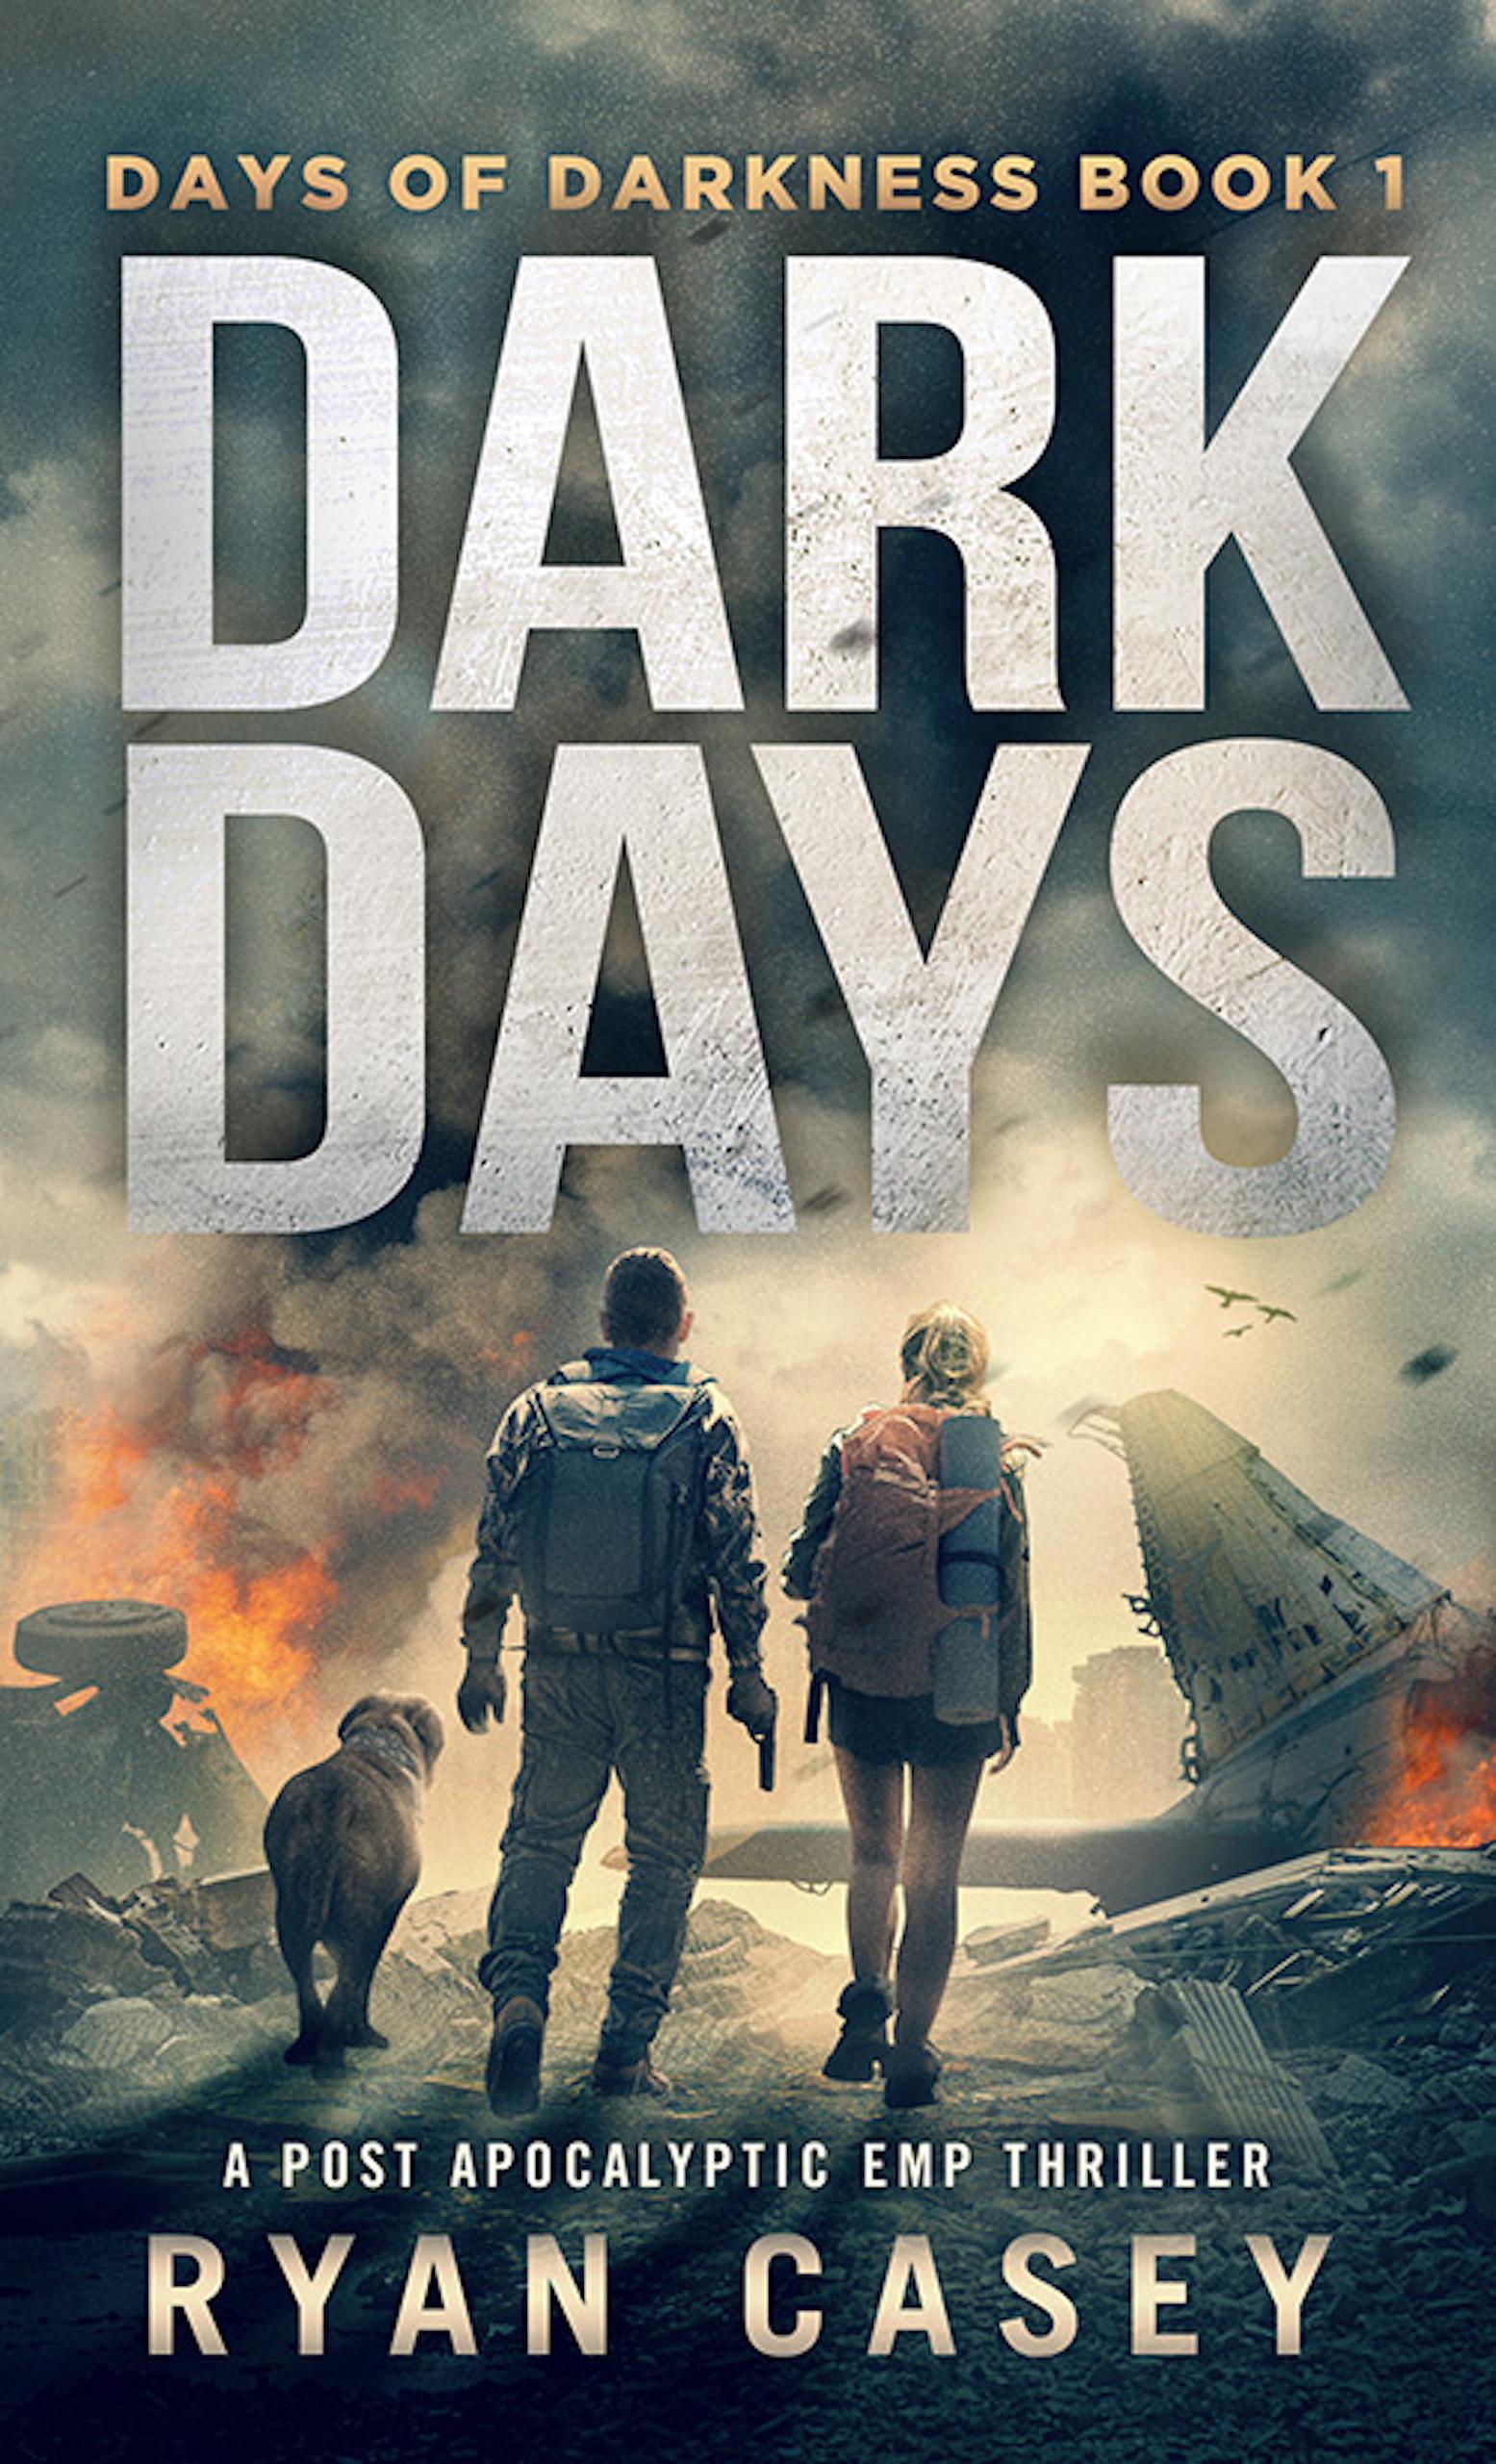 when darkness falls book 2